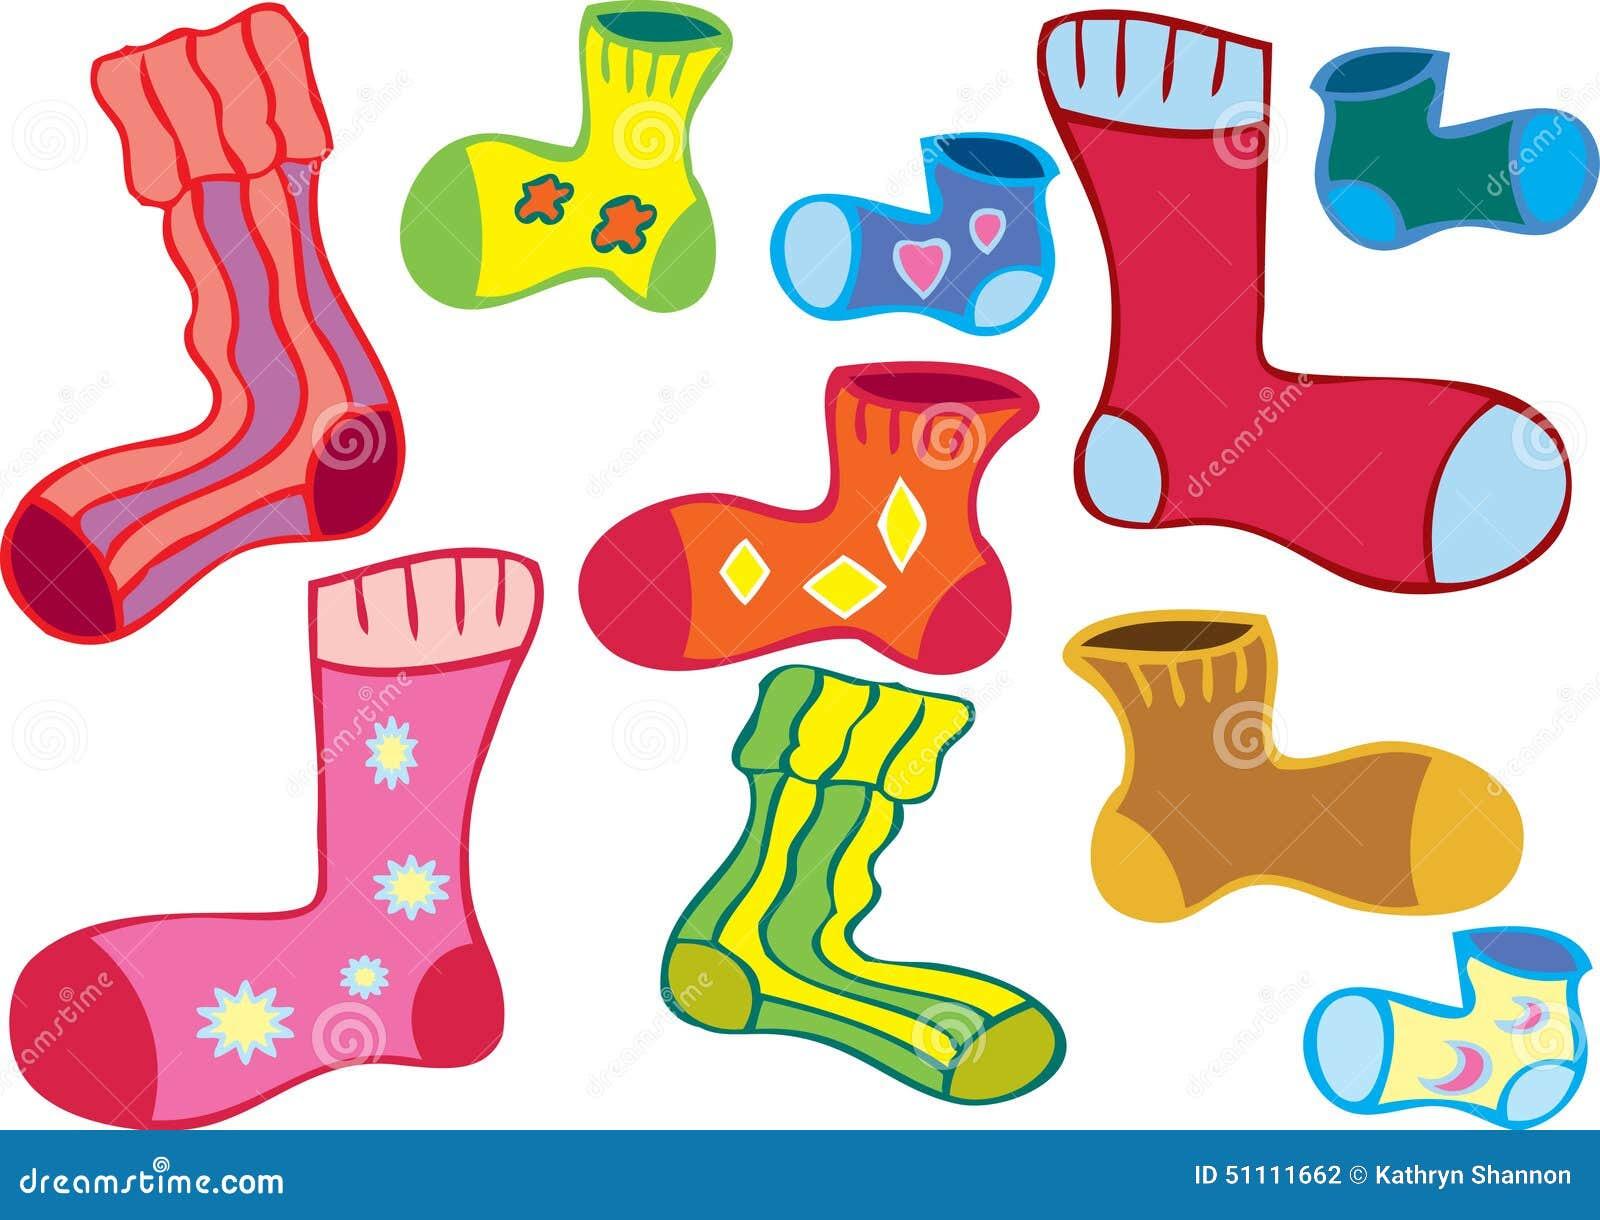 odd socks cartoon several different colored 51111662